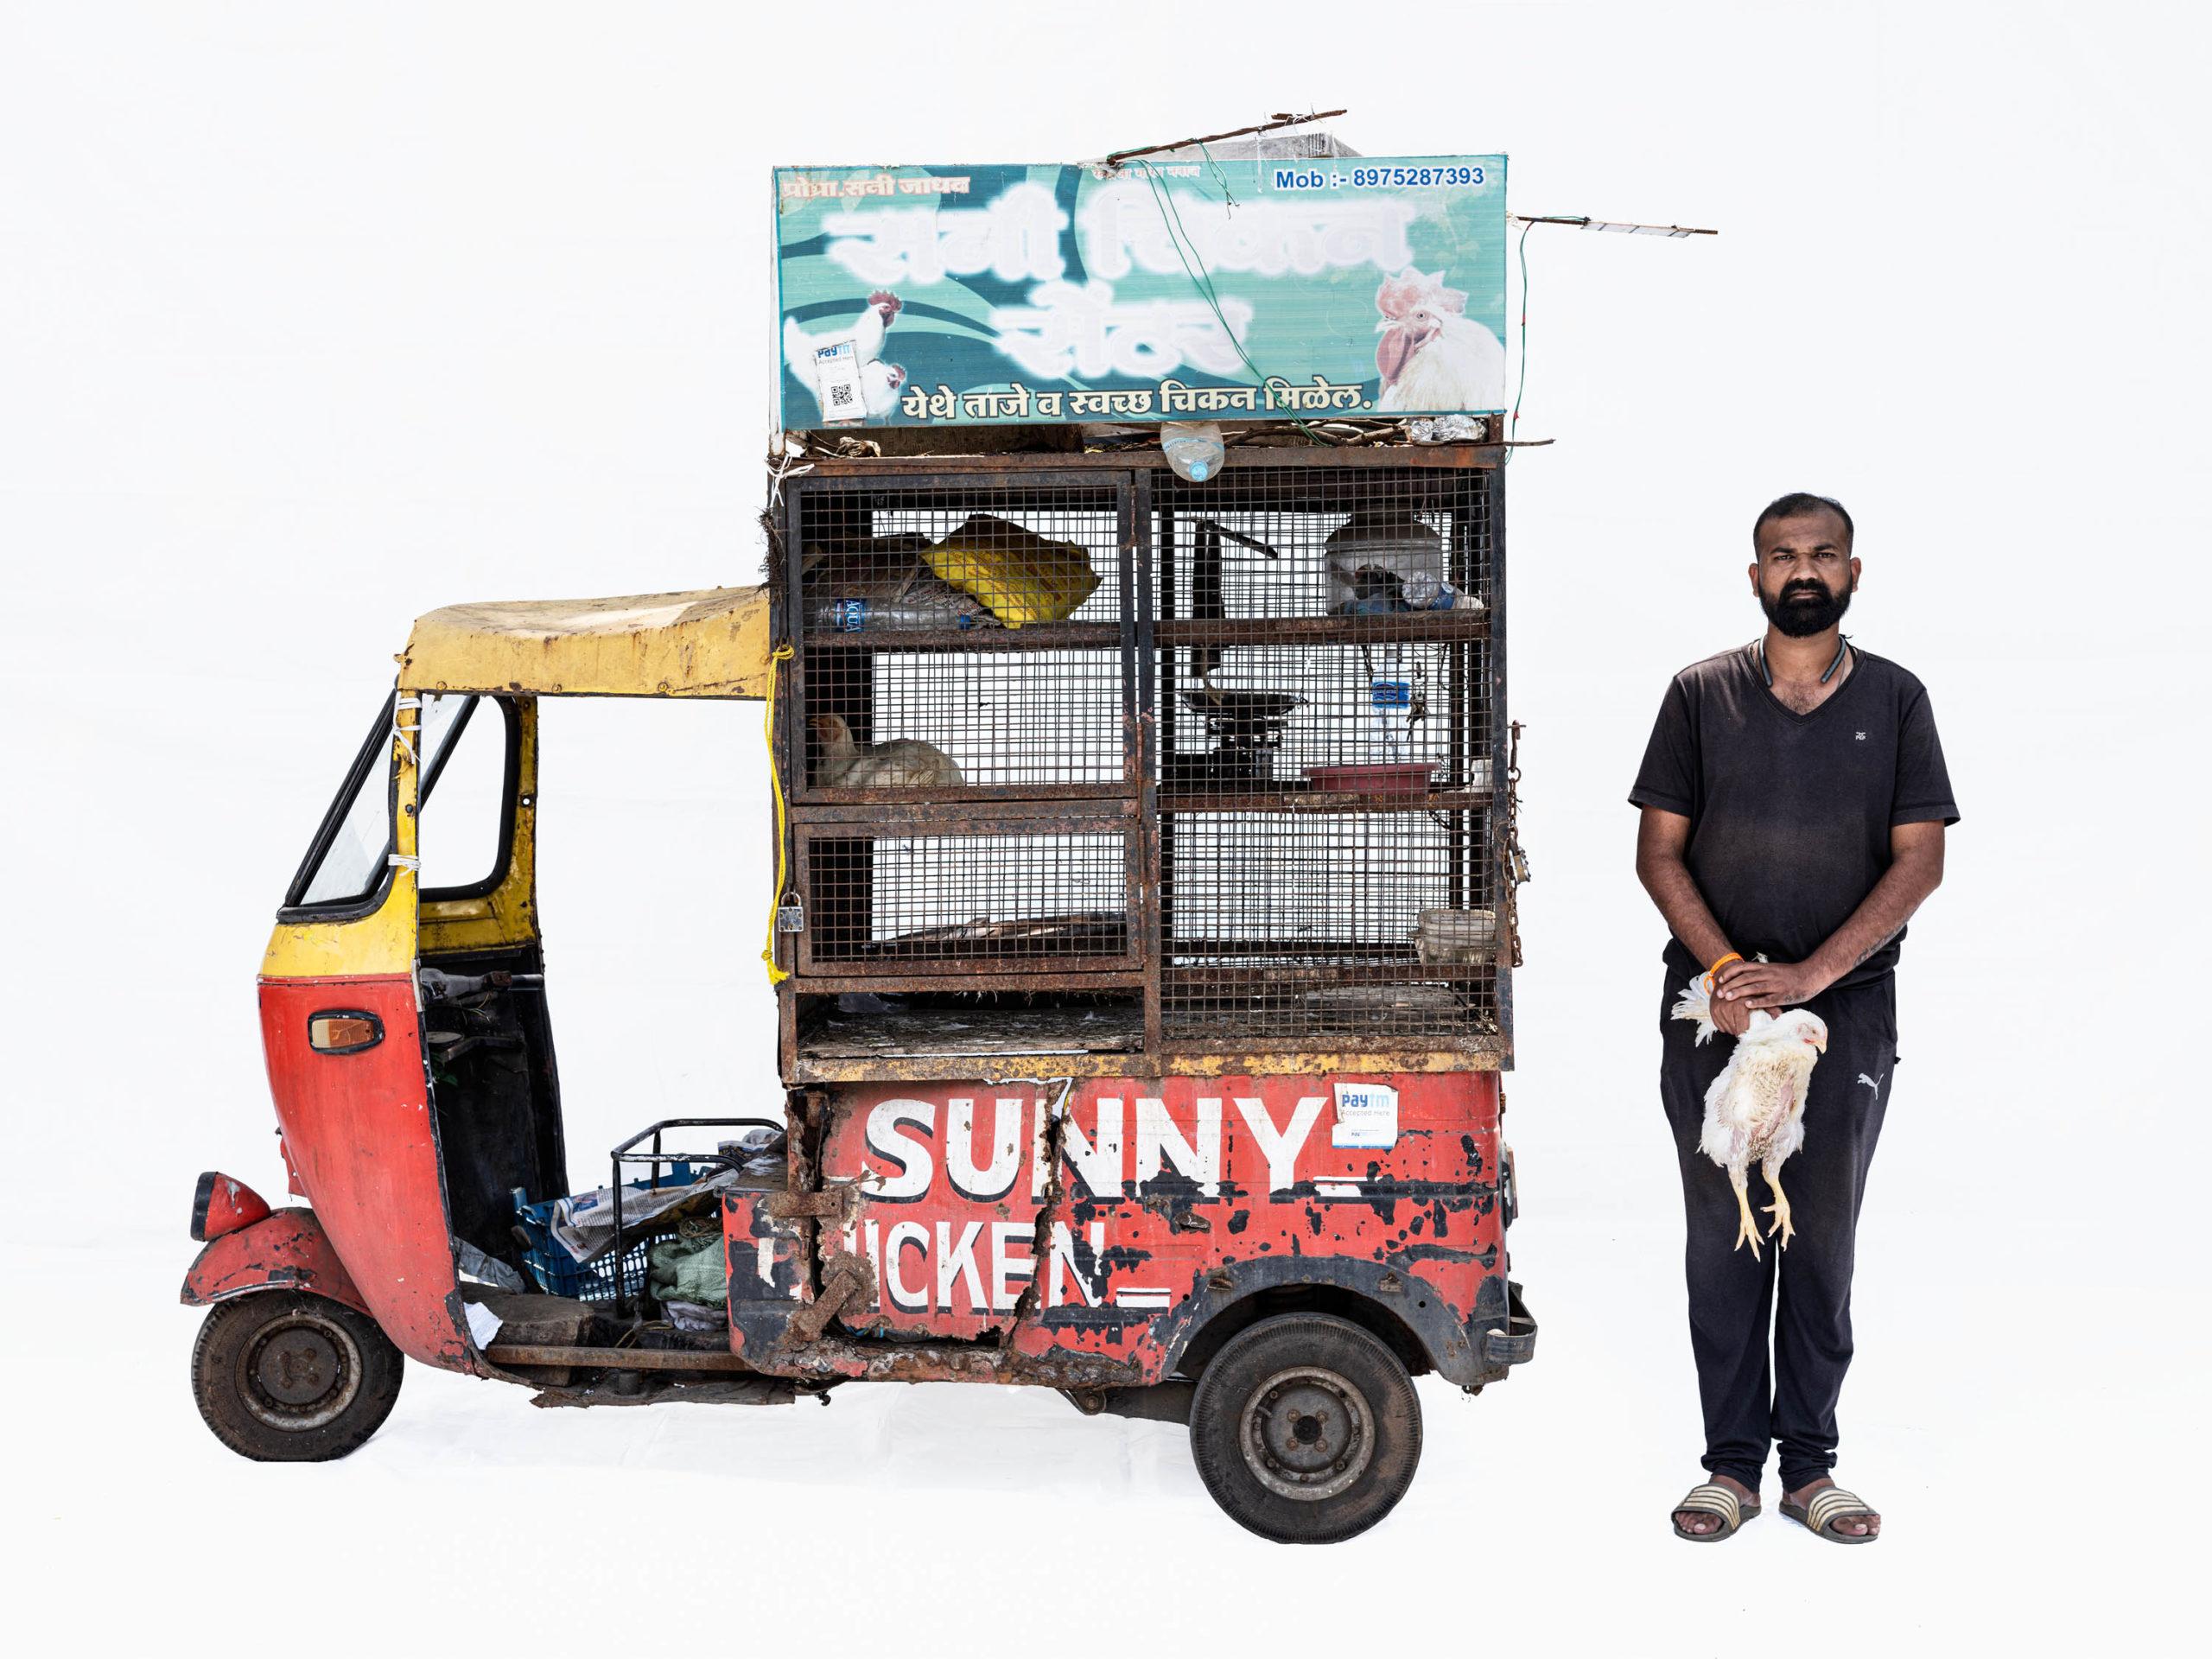 Bajaj autorickshaw #1; Chicken seller Sunny Jadhav (Nashik, Maharashtra)